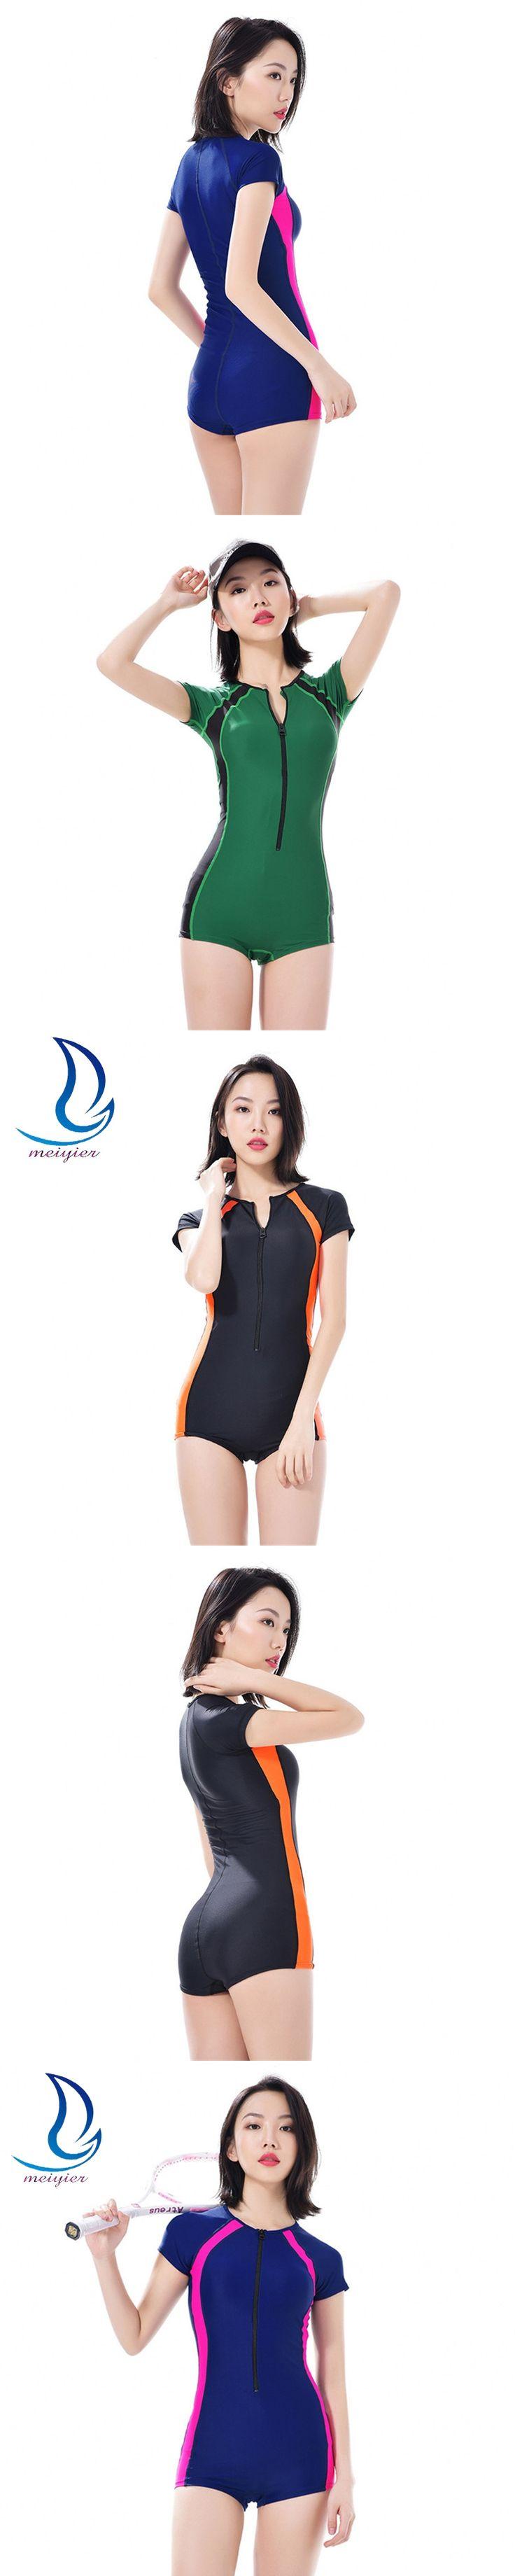 MEIYIER Women Short Sleeve Wetsuits Triathlon Wetsuit One Piece Scuba Diving Suit Jumpsuit Snorkeling Female Swimwear Rash Guard